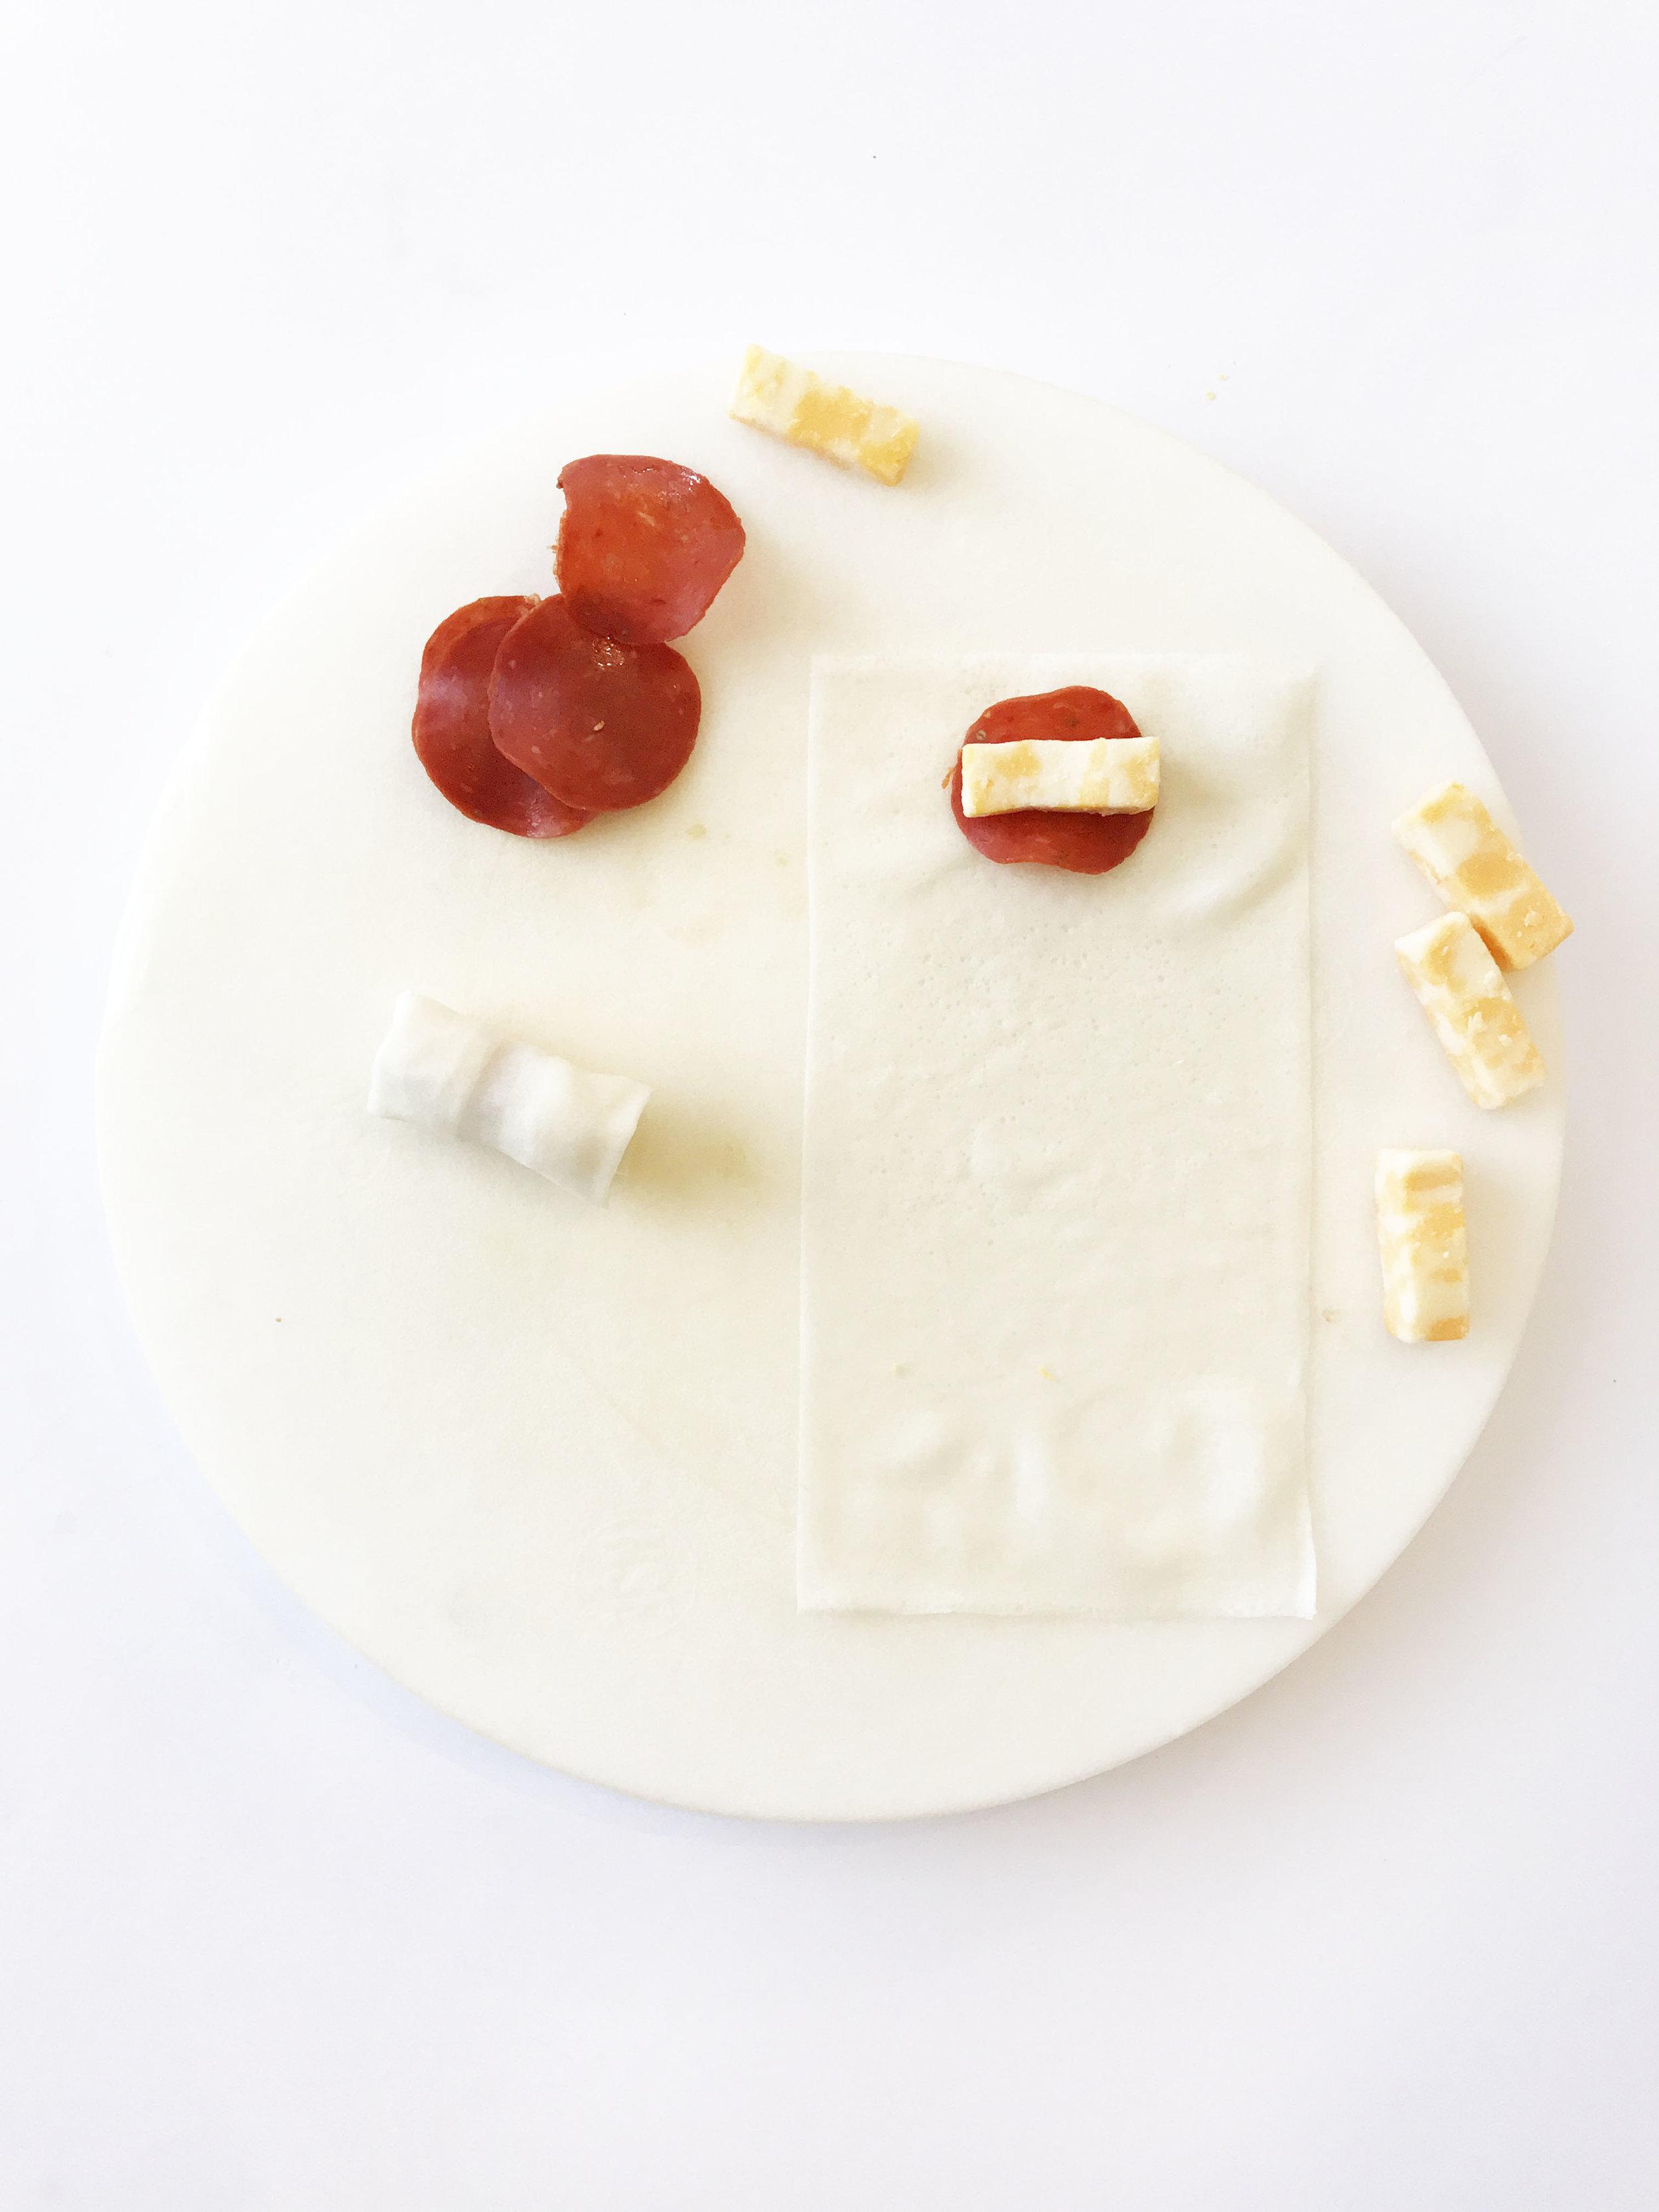 pizza-bites-cheese-sticks11.jpg